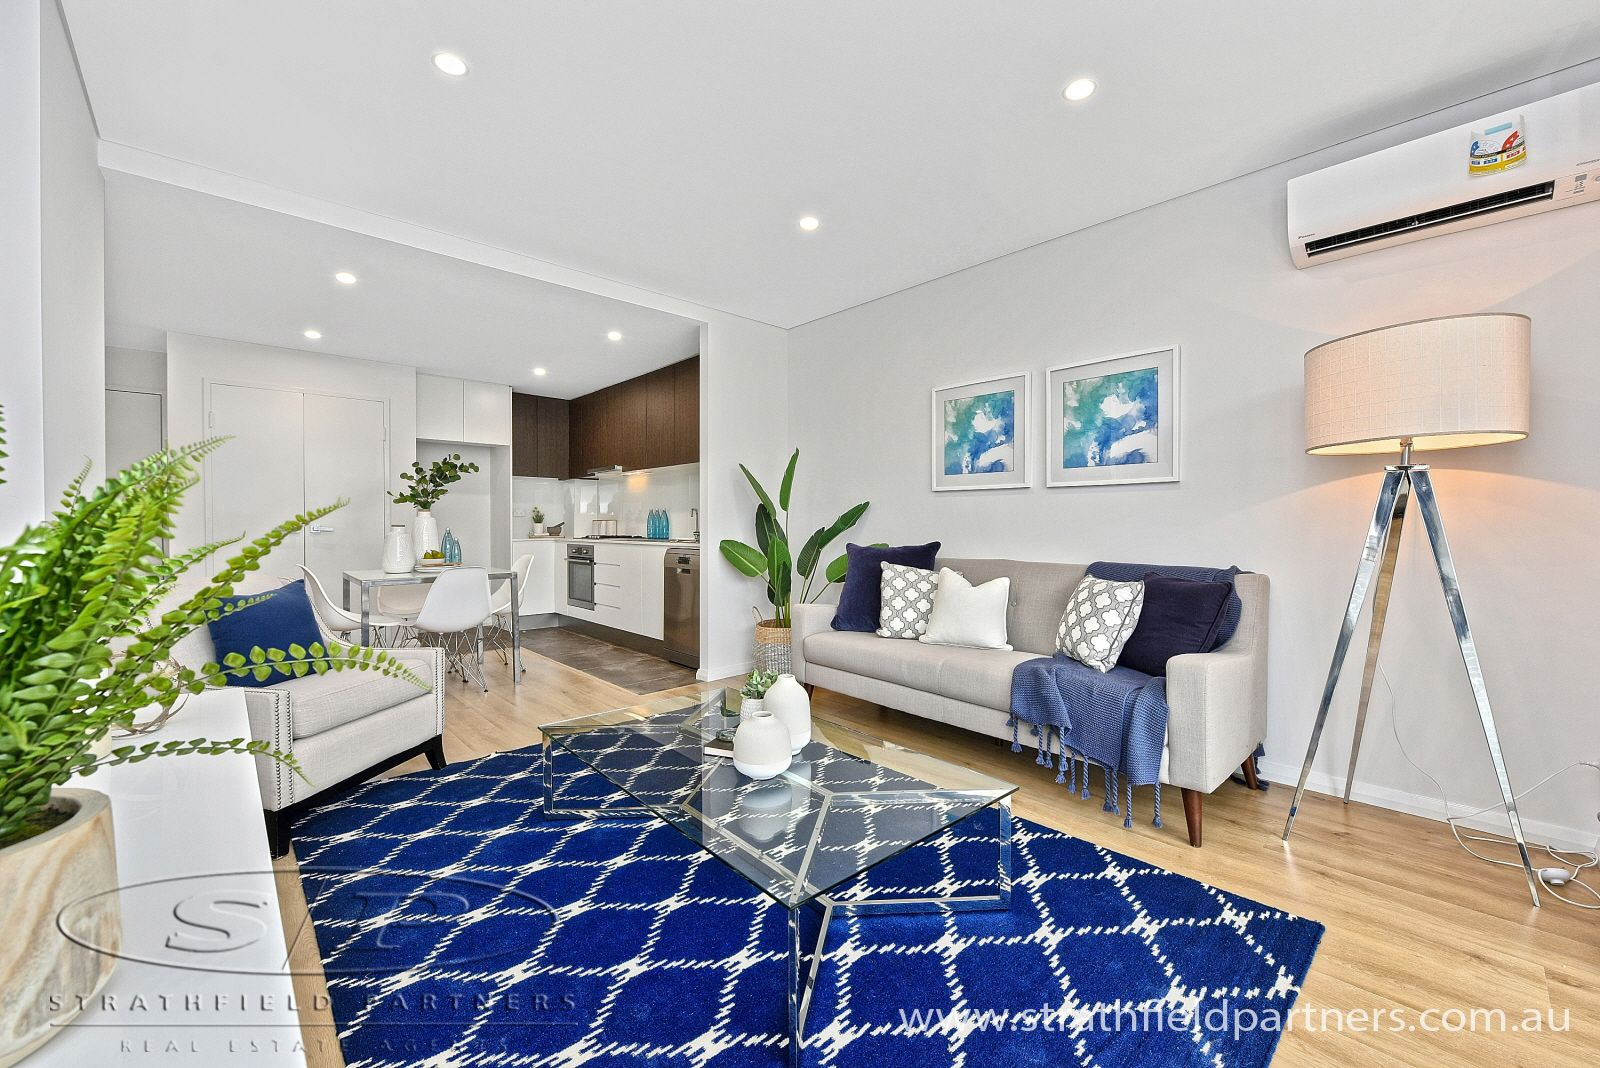 19/3 Anselm Street, Strathfield South NSW 2136, Image 0